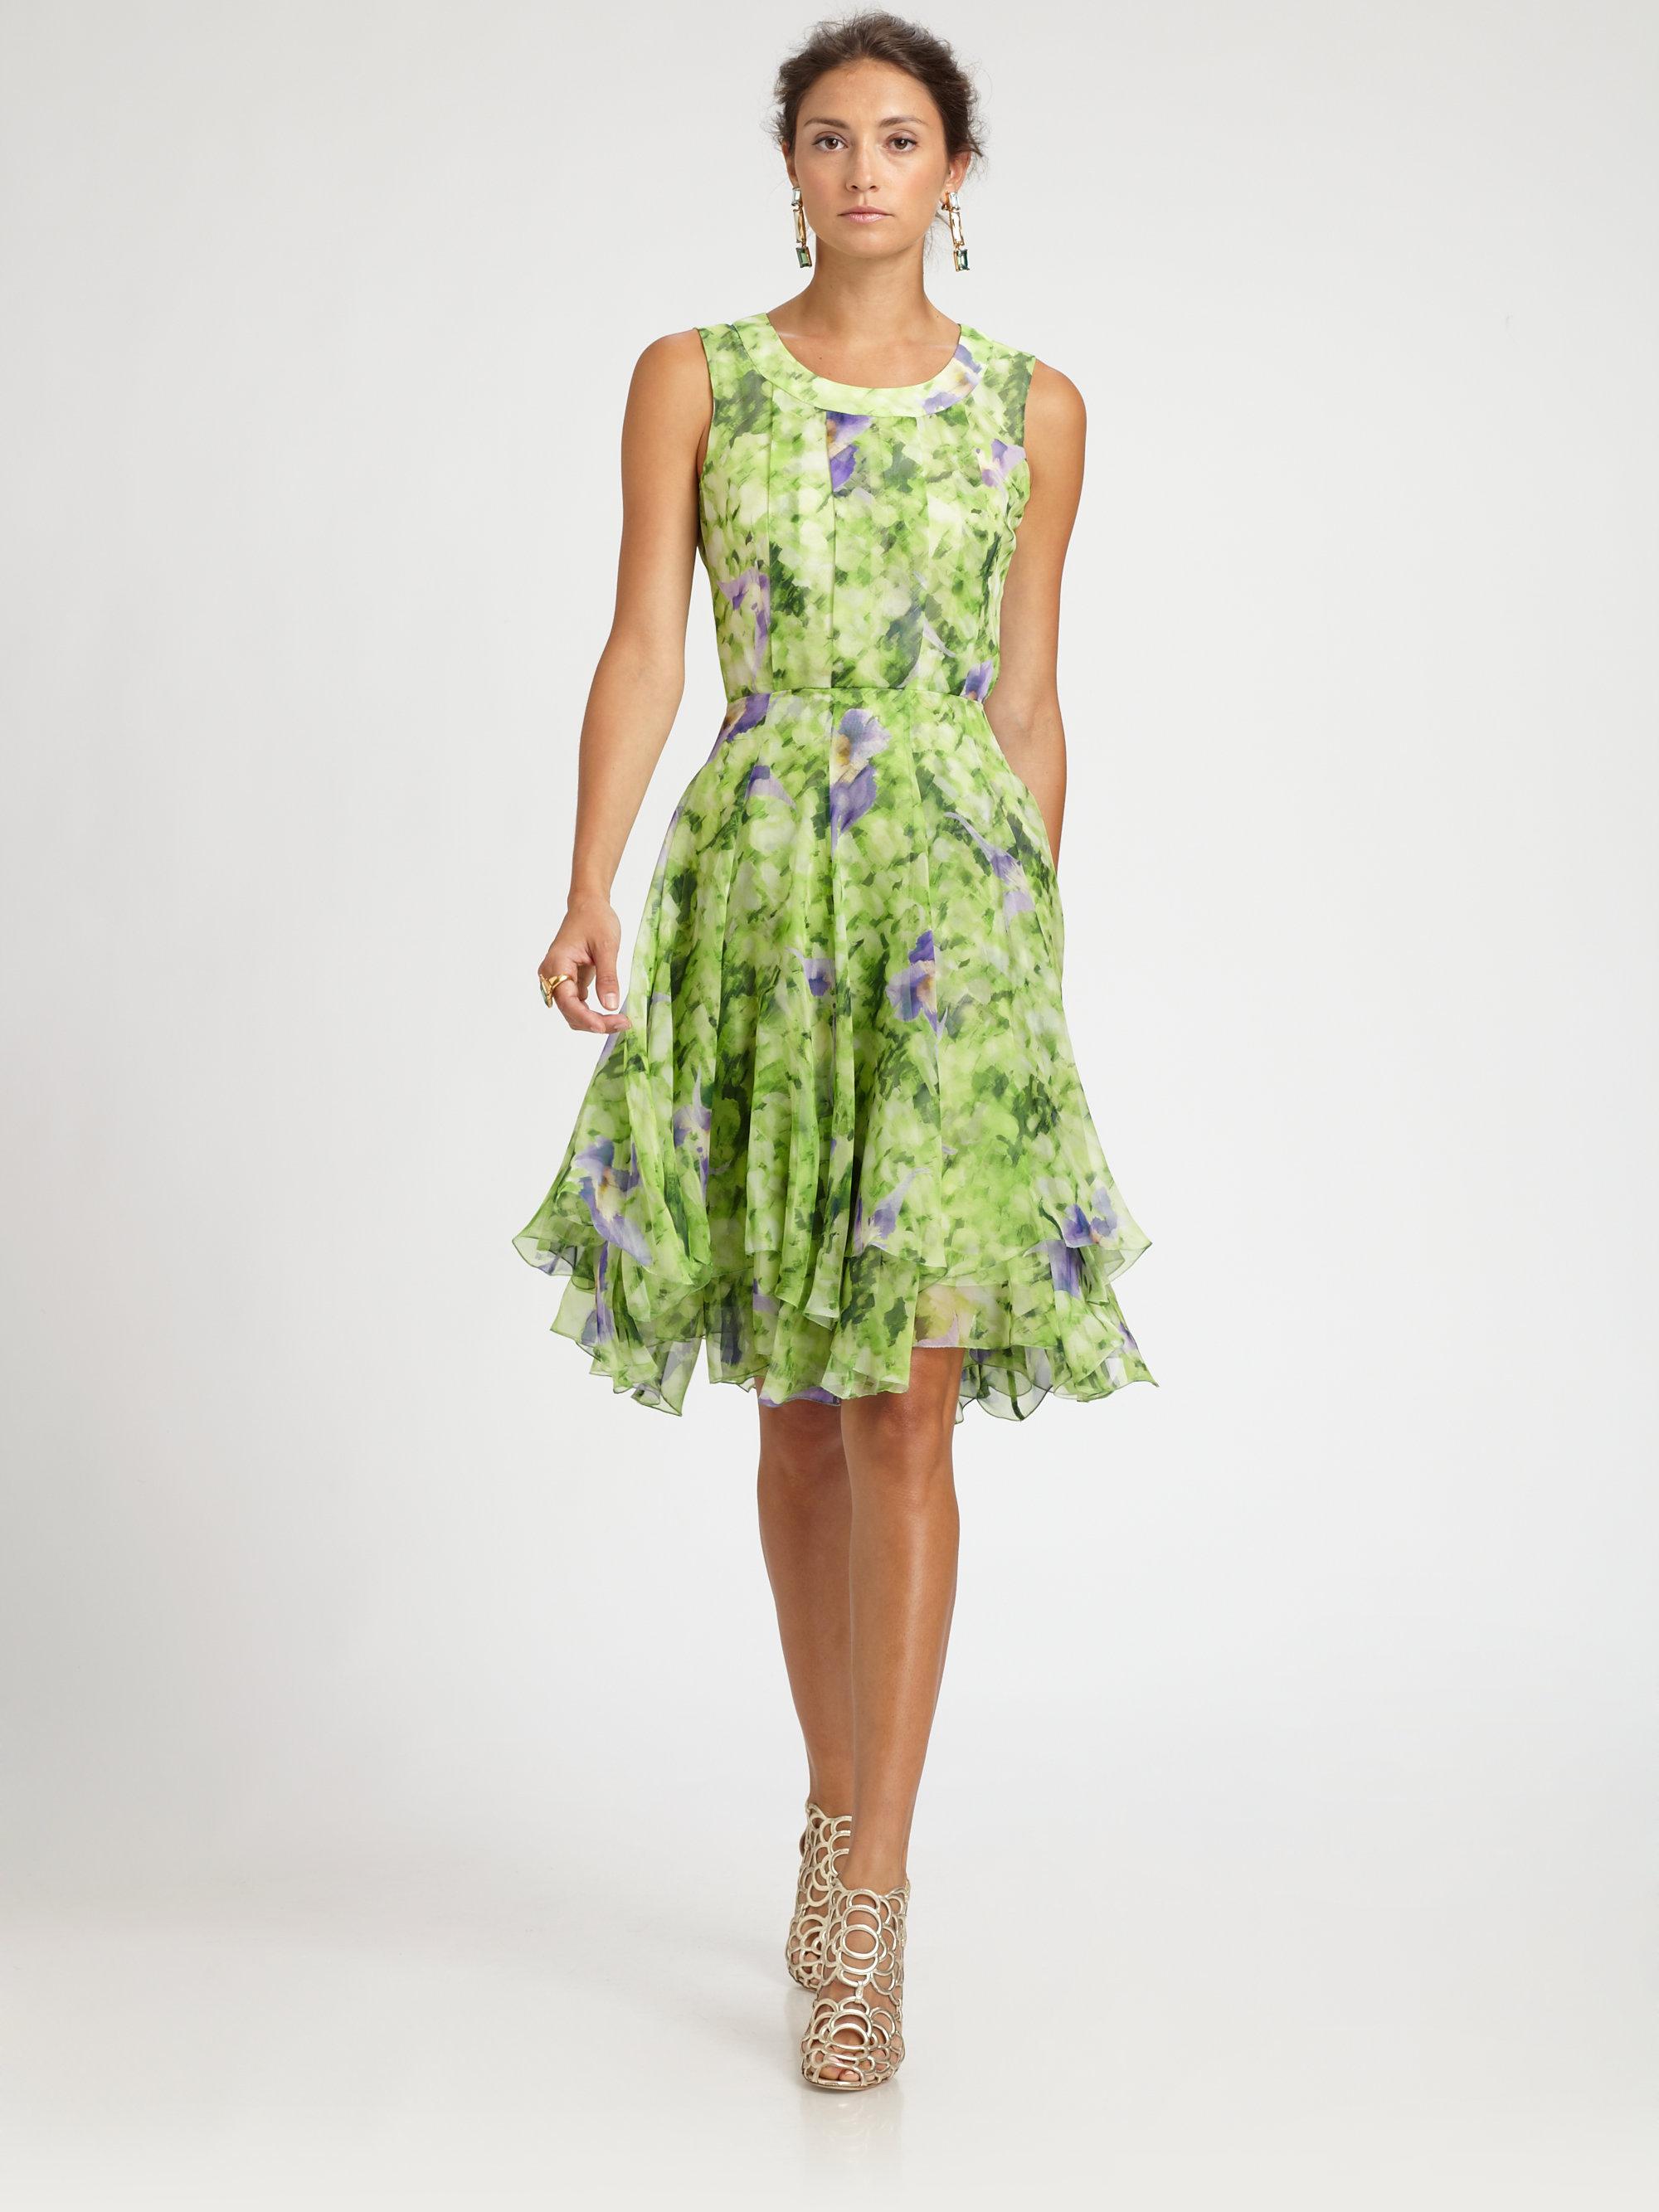 Oscar De La Renta Floral Silk Dress Lyst